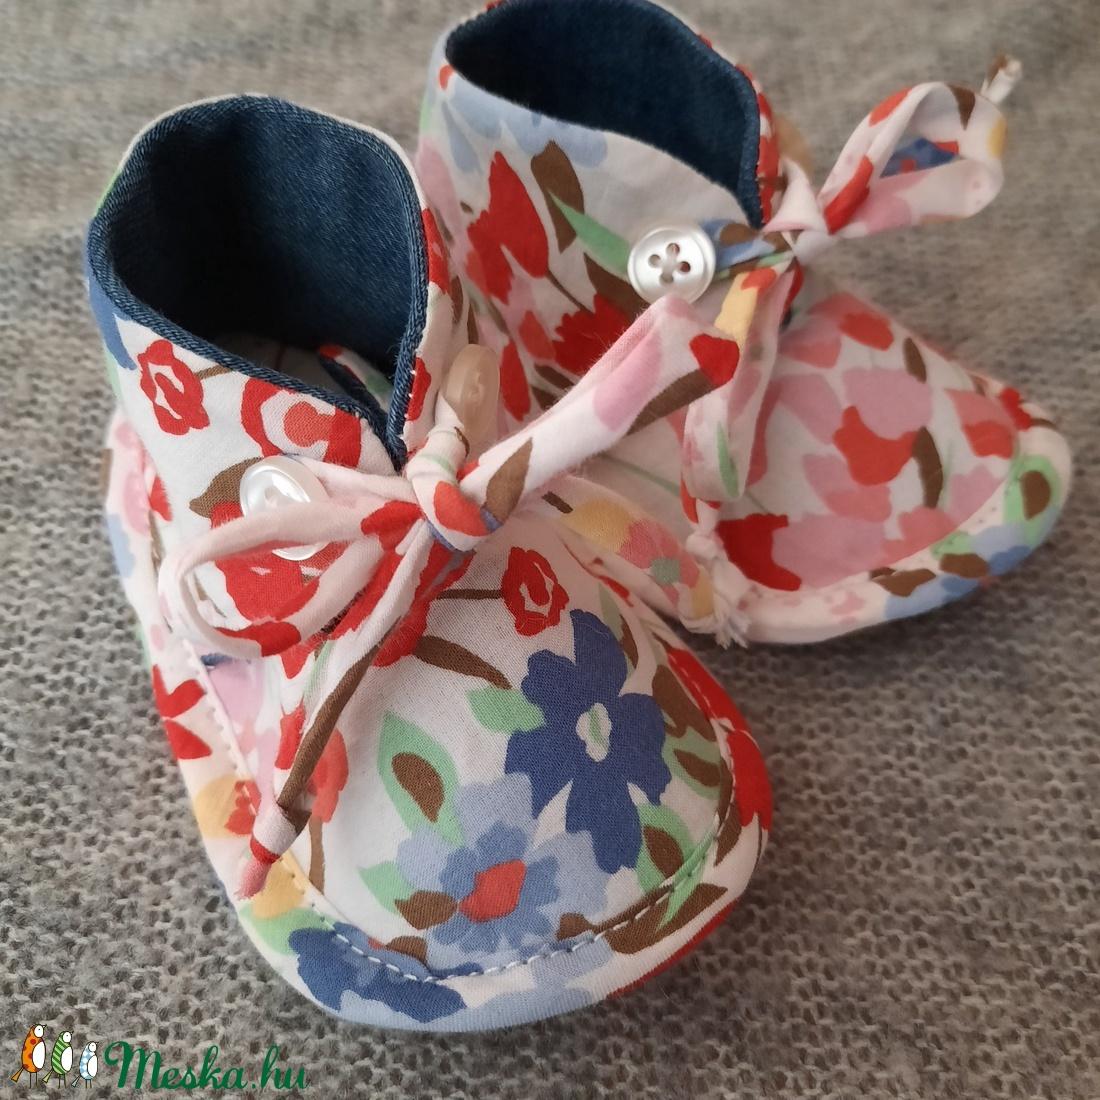 Baby cipő Virág (Birodalom) - Meska.hu